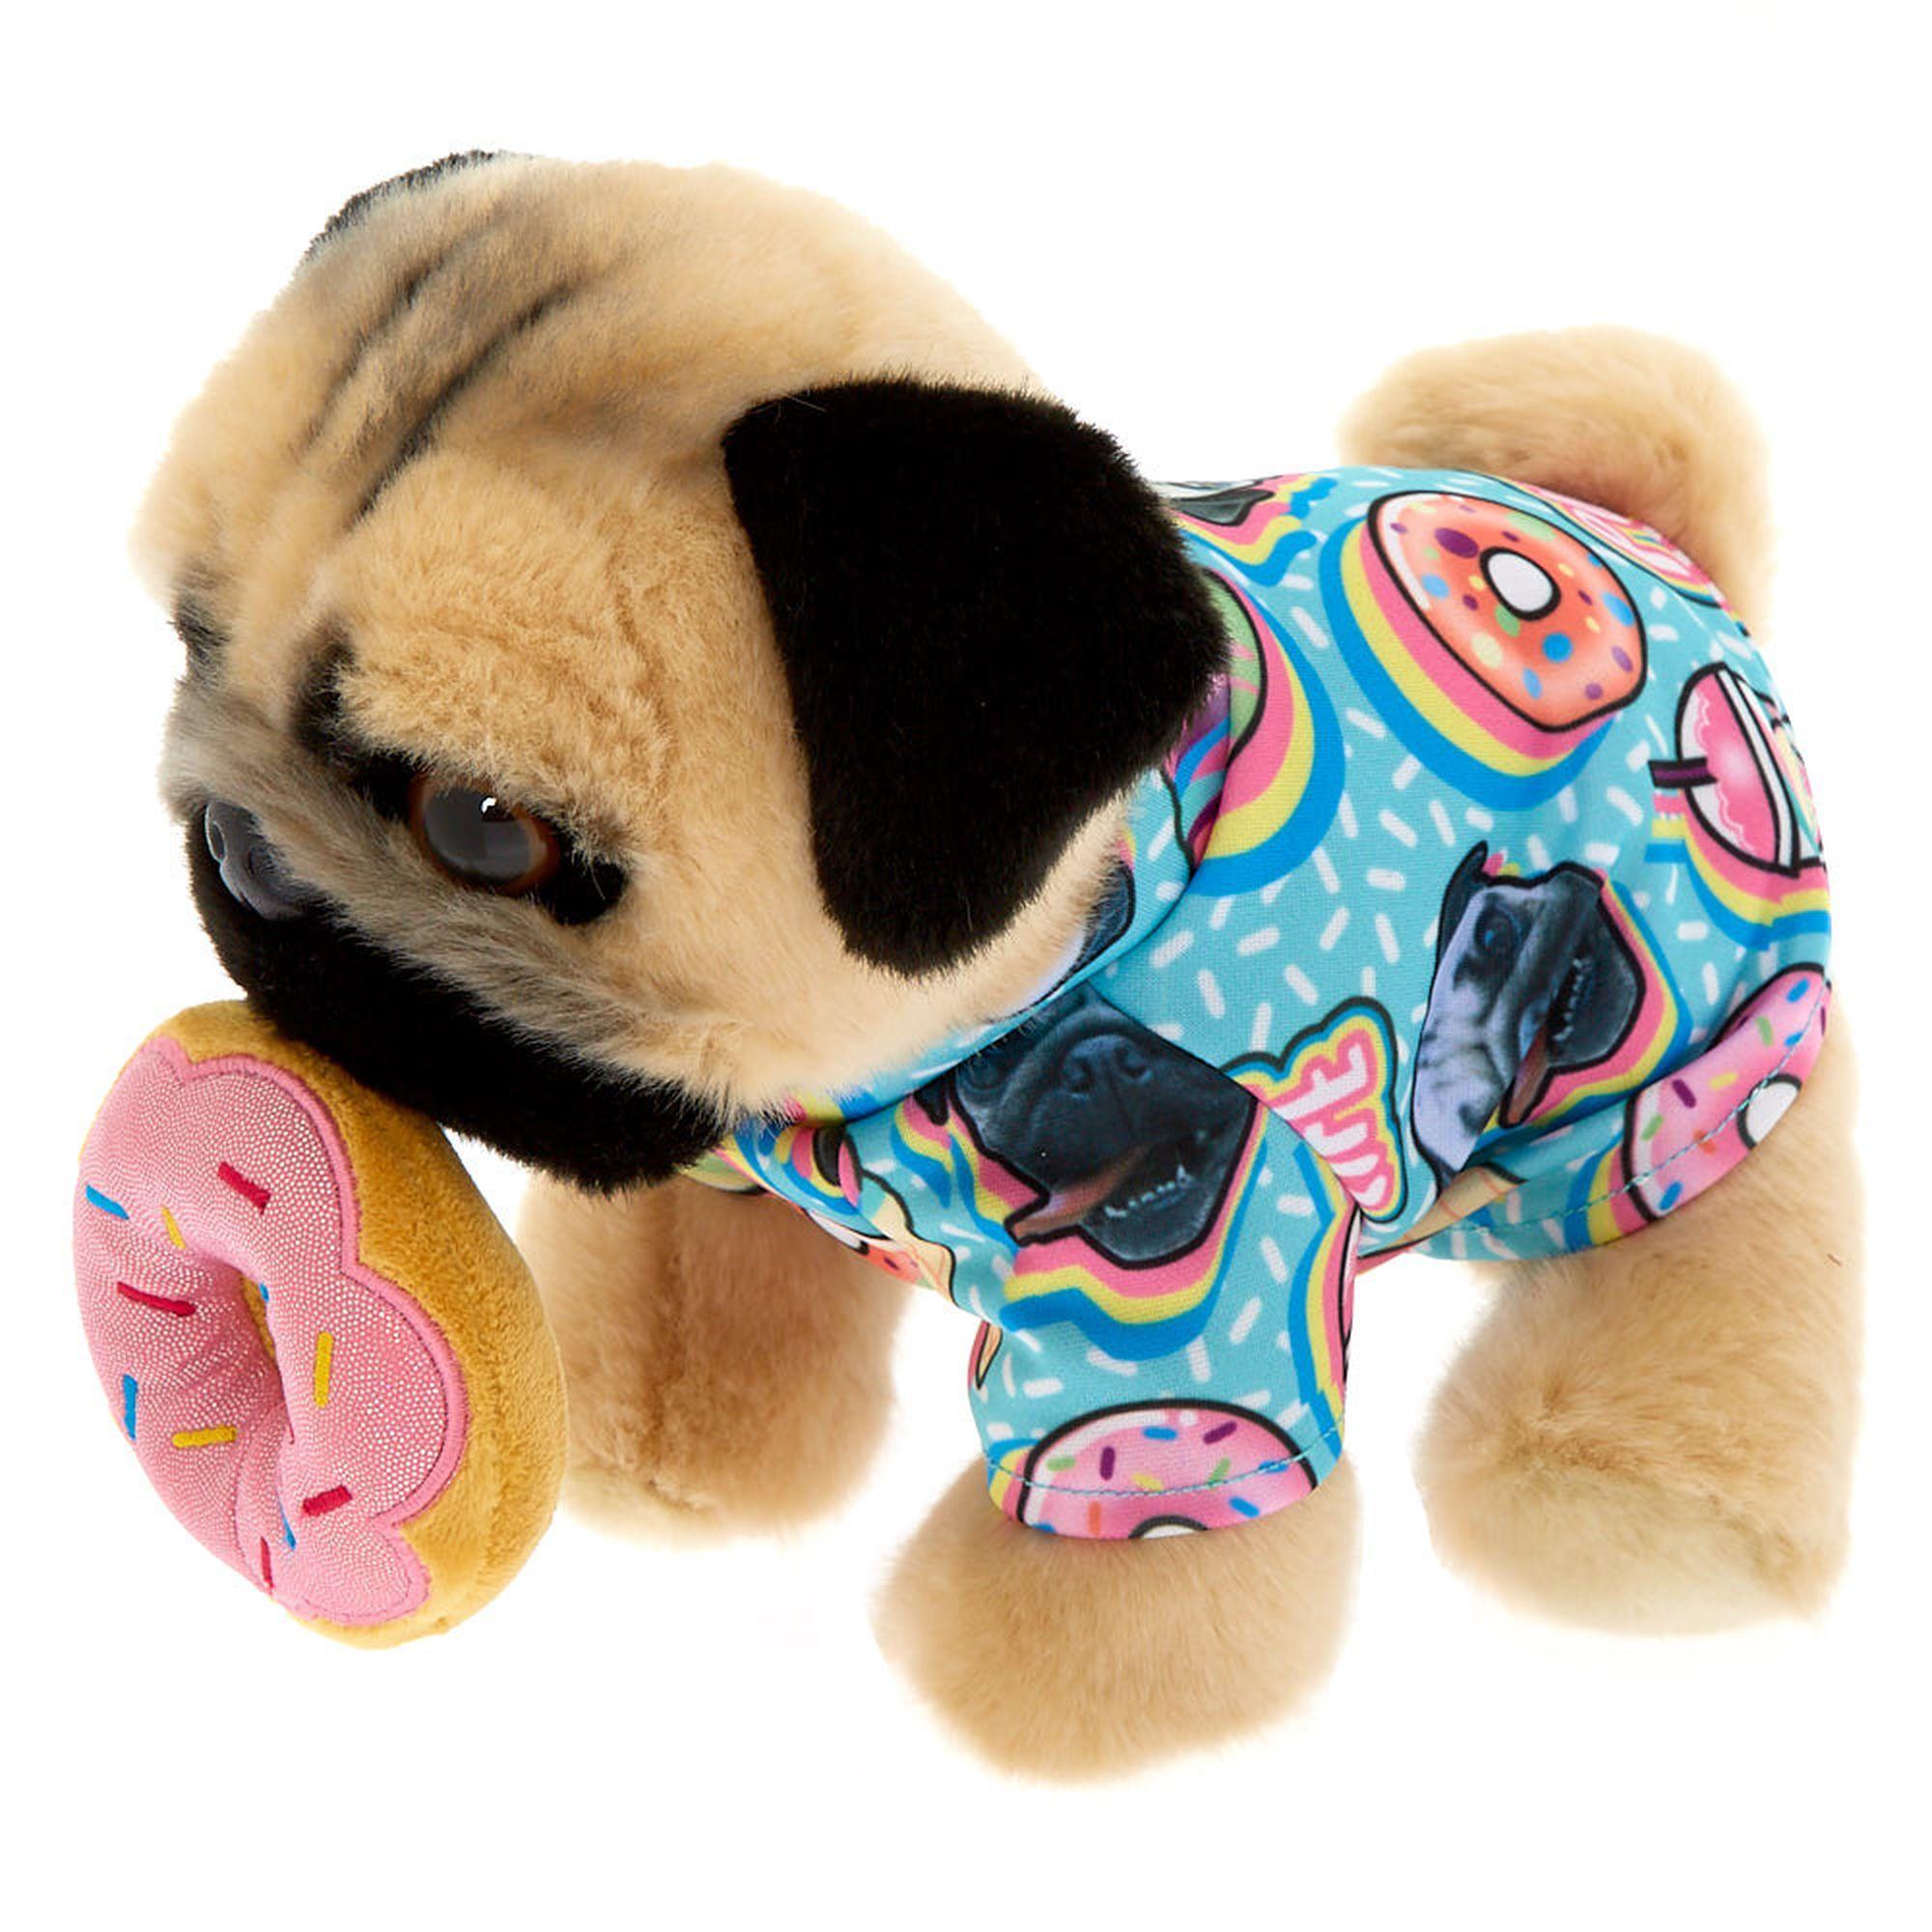 Claire S Doug The Pug C Donut Medium Plush Toy Cream Doug The